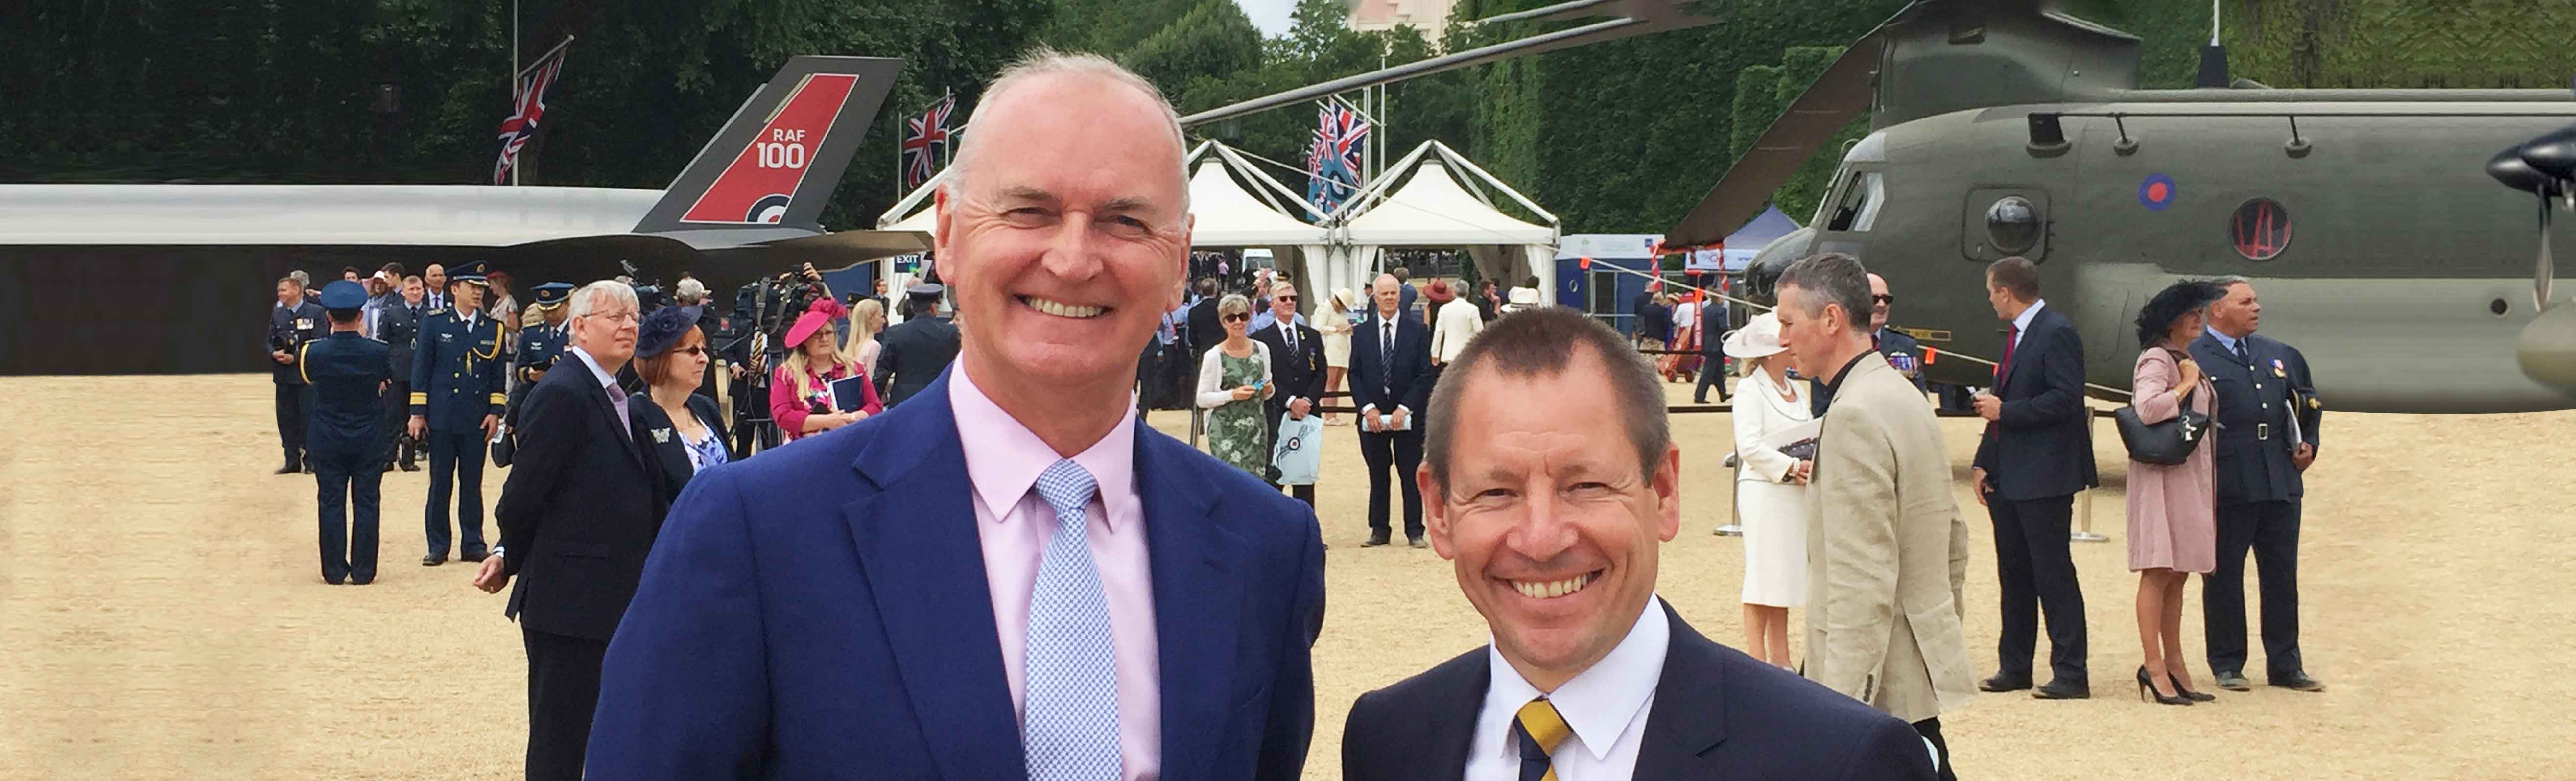 TAG航空支持英国皇家空军100周年庆典